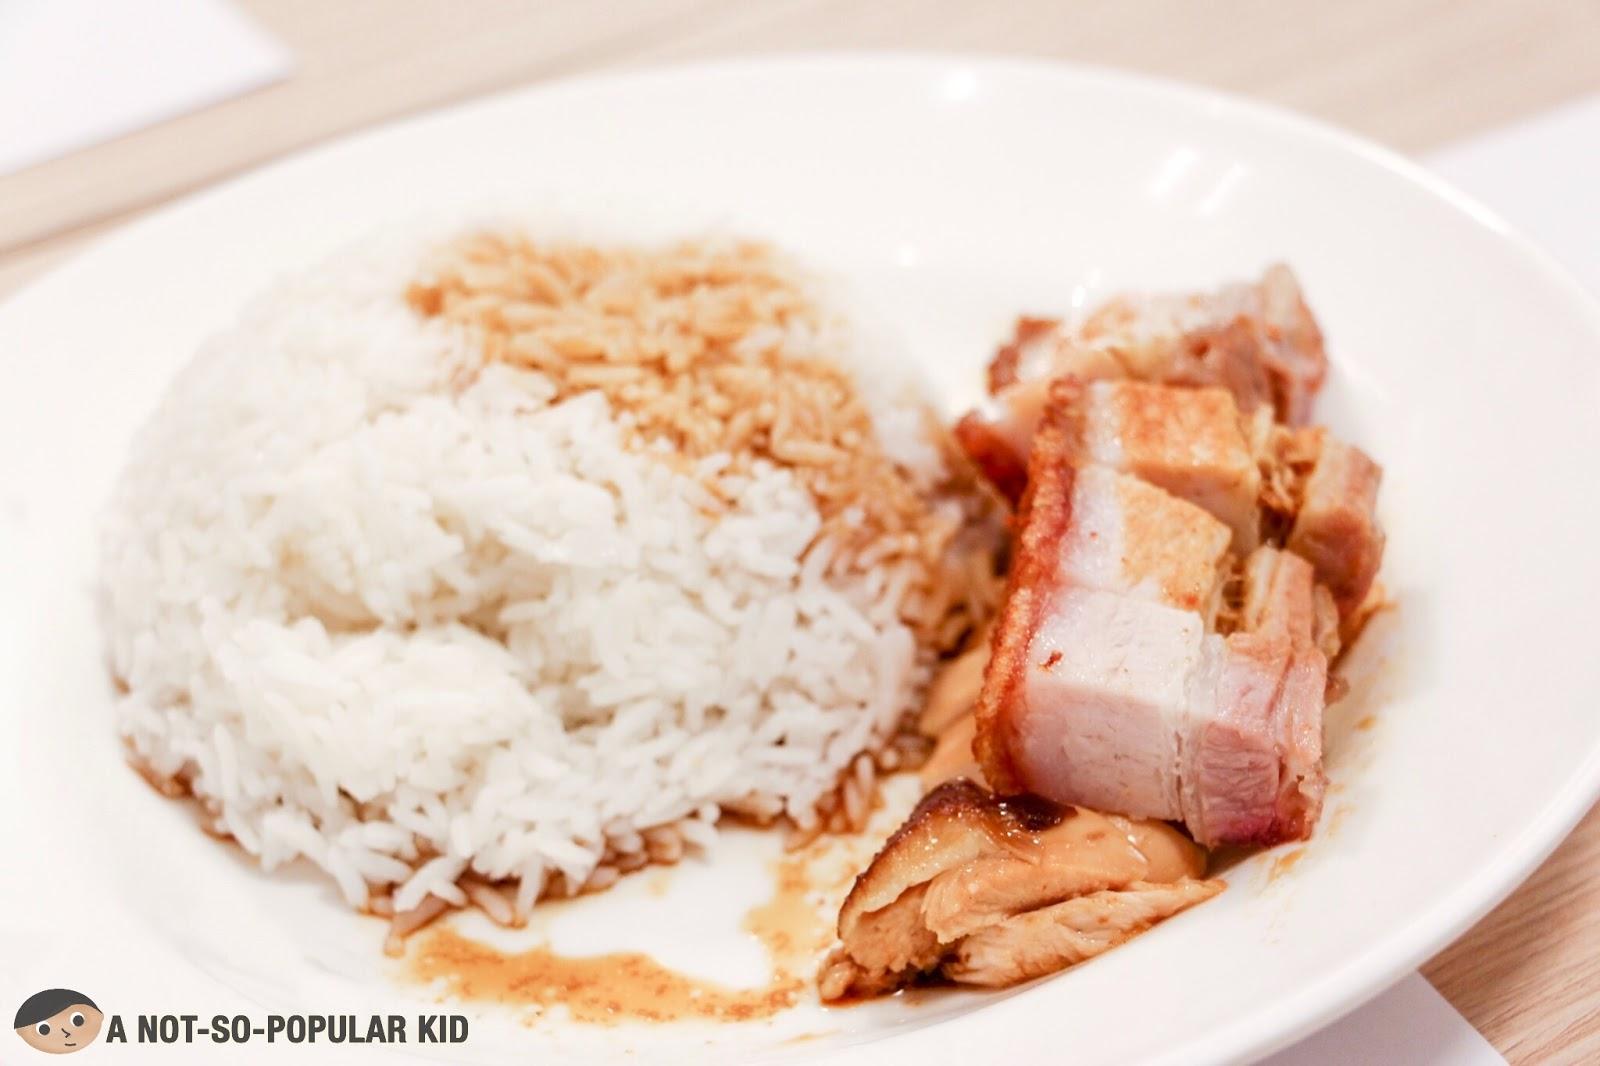 Honolulu HK Café now in Manila, Philippines - A Not-So-Popular Kid